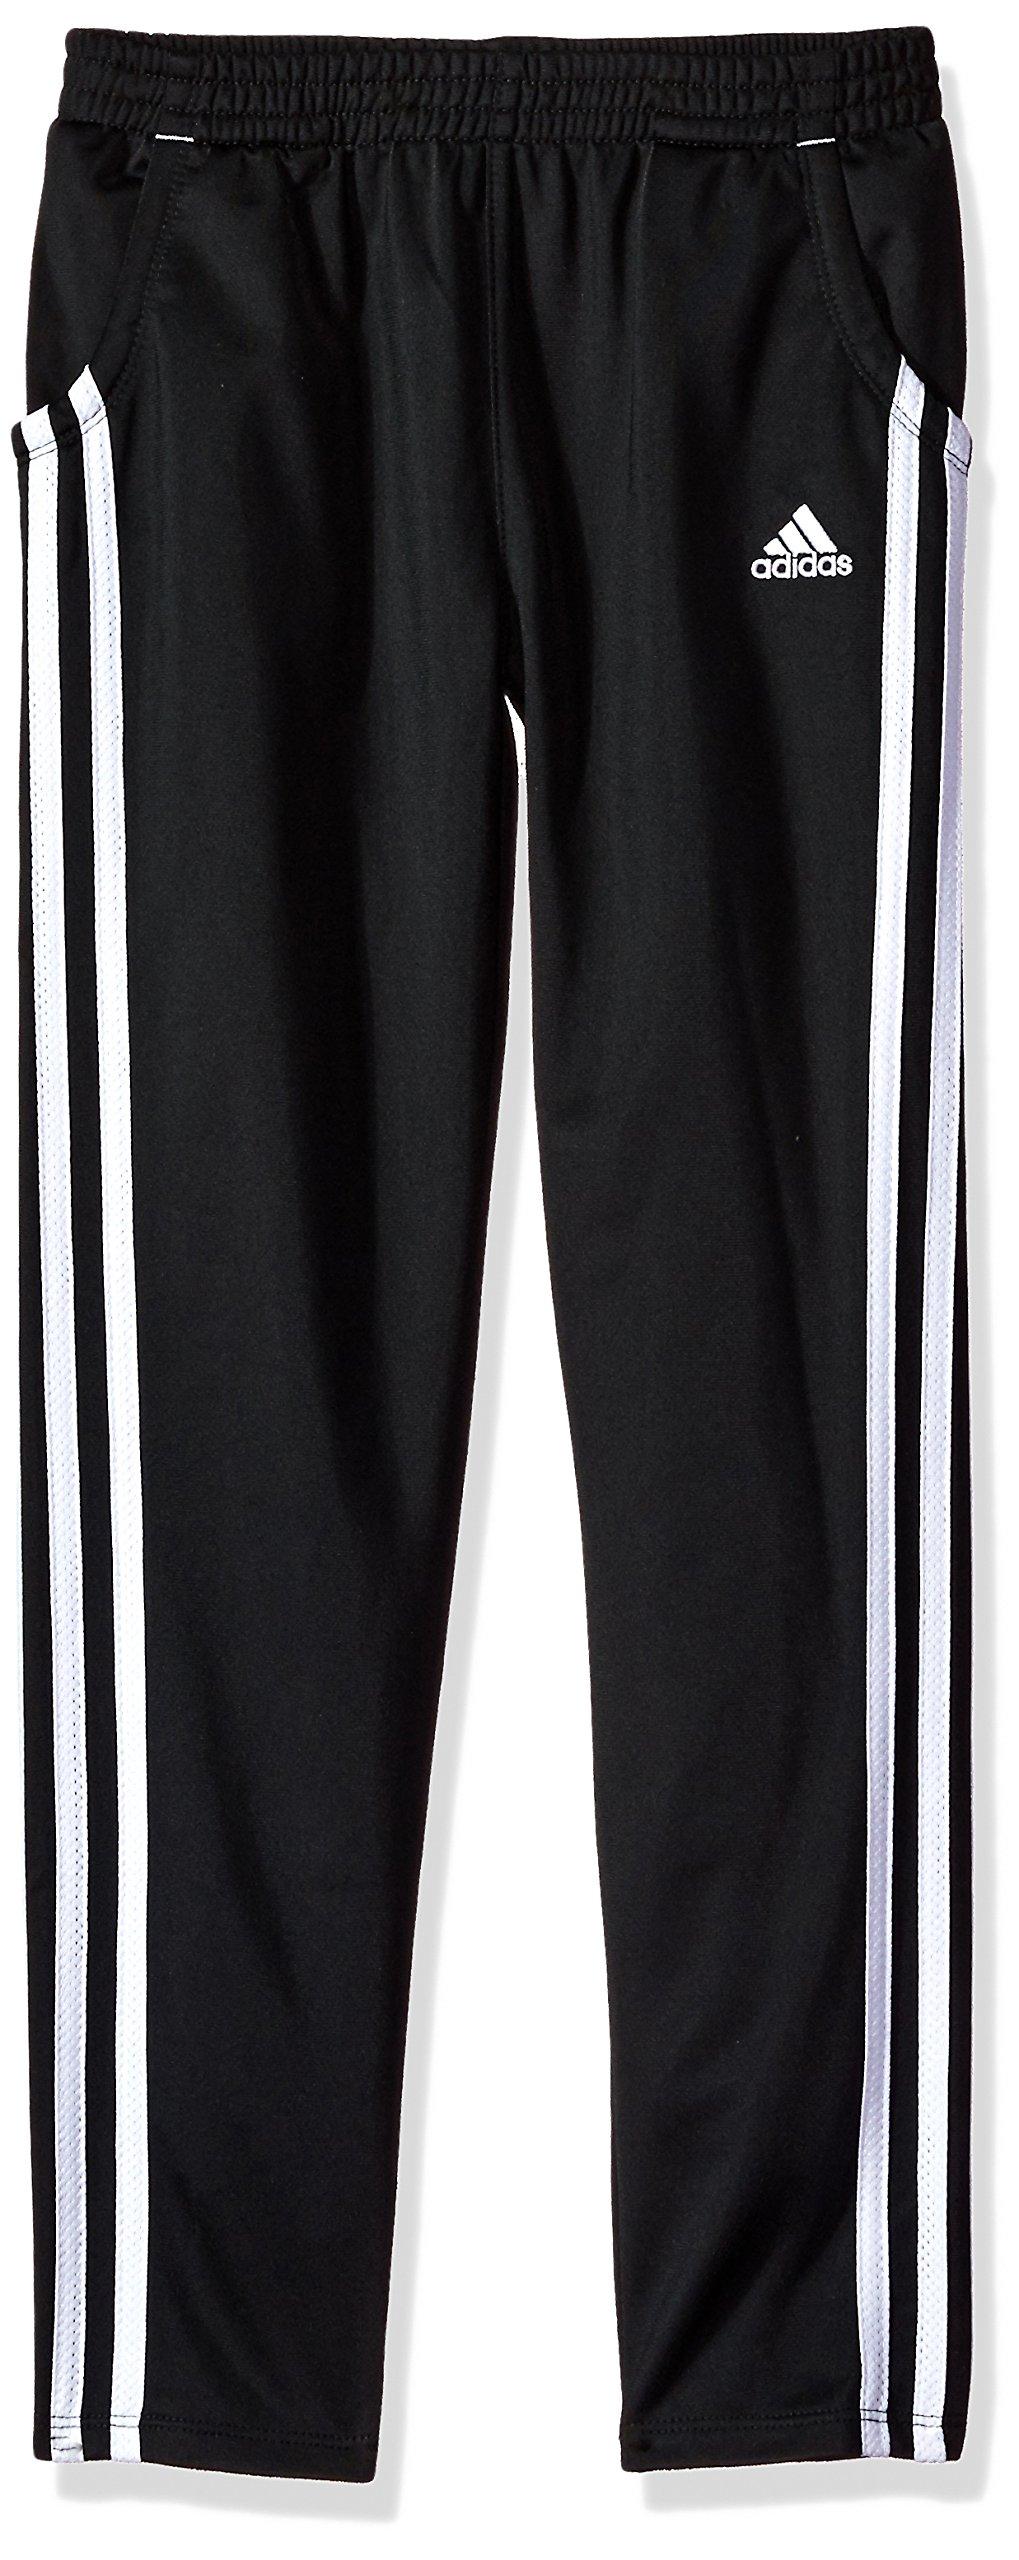 adidas Girls' Big Warm Up Tricot Pant, ADI Black, S (7/8) by adidas